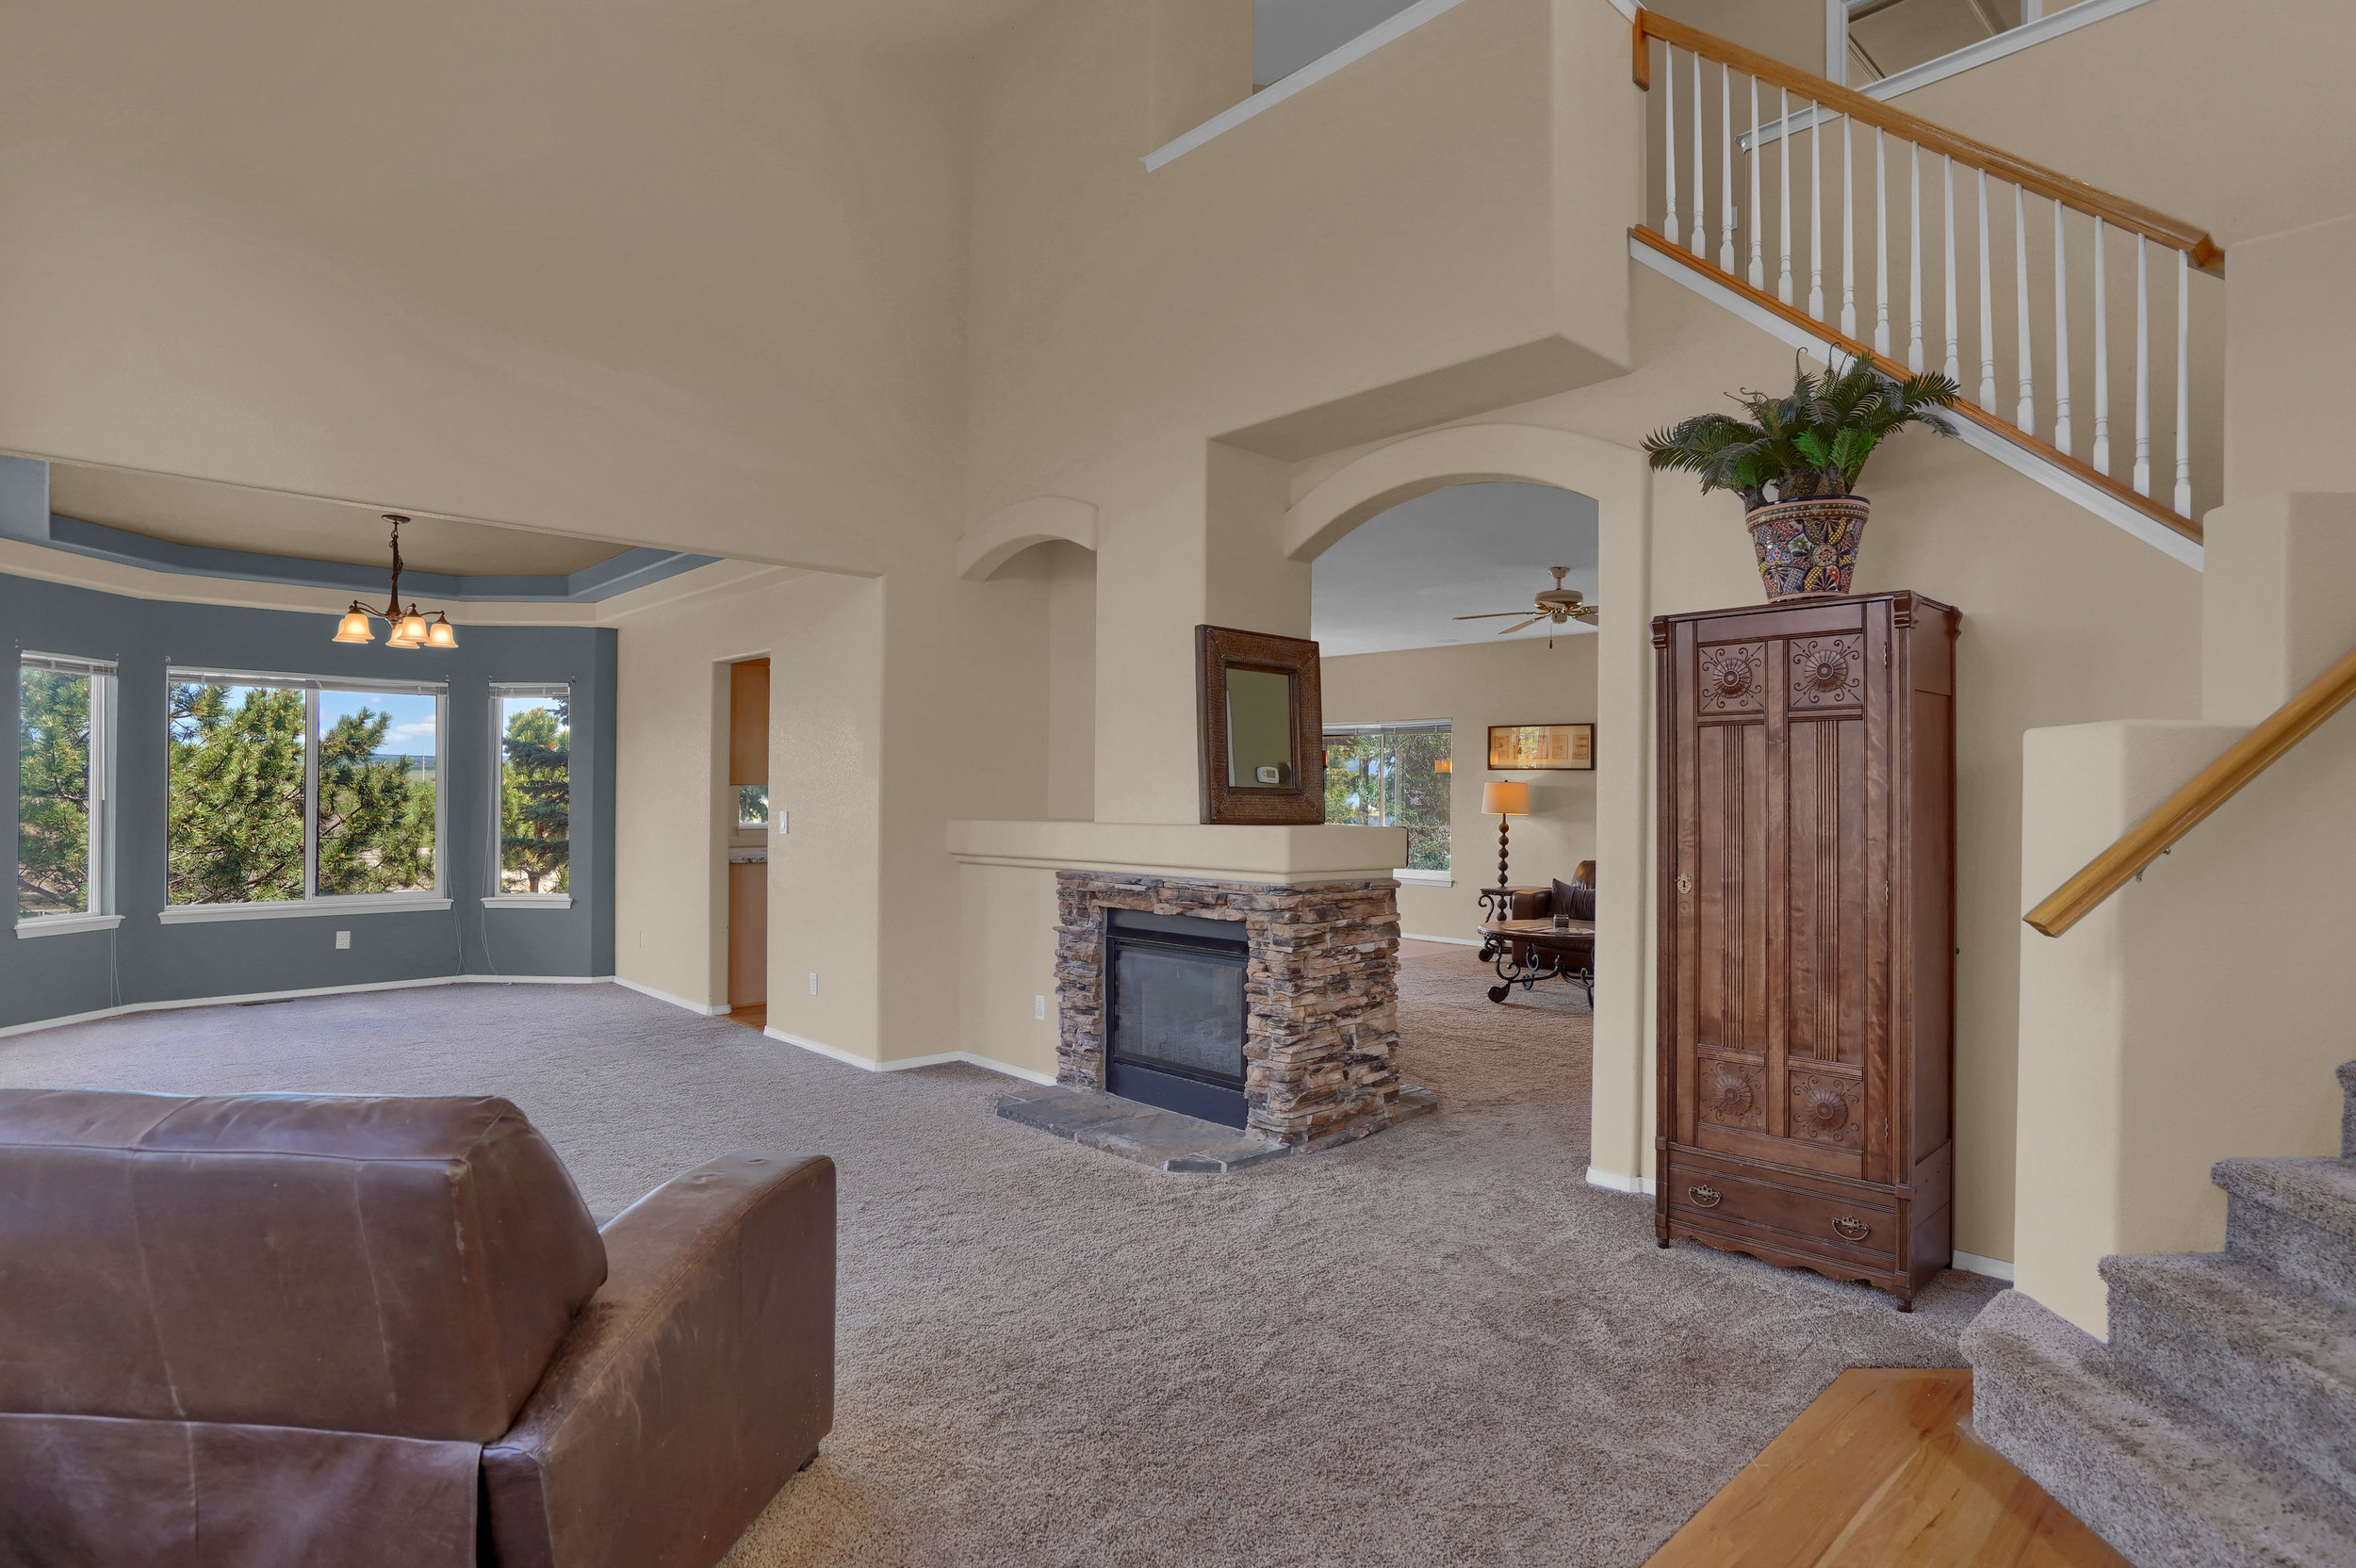 2756 Kittyhawk Road Colorado-print-003-019-Living Room-3934x2618-300dpi.jpg